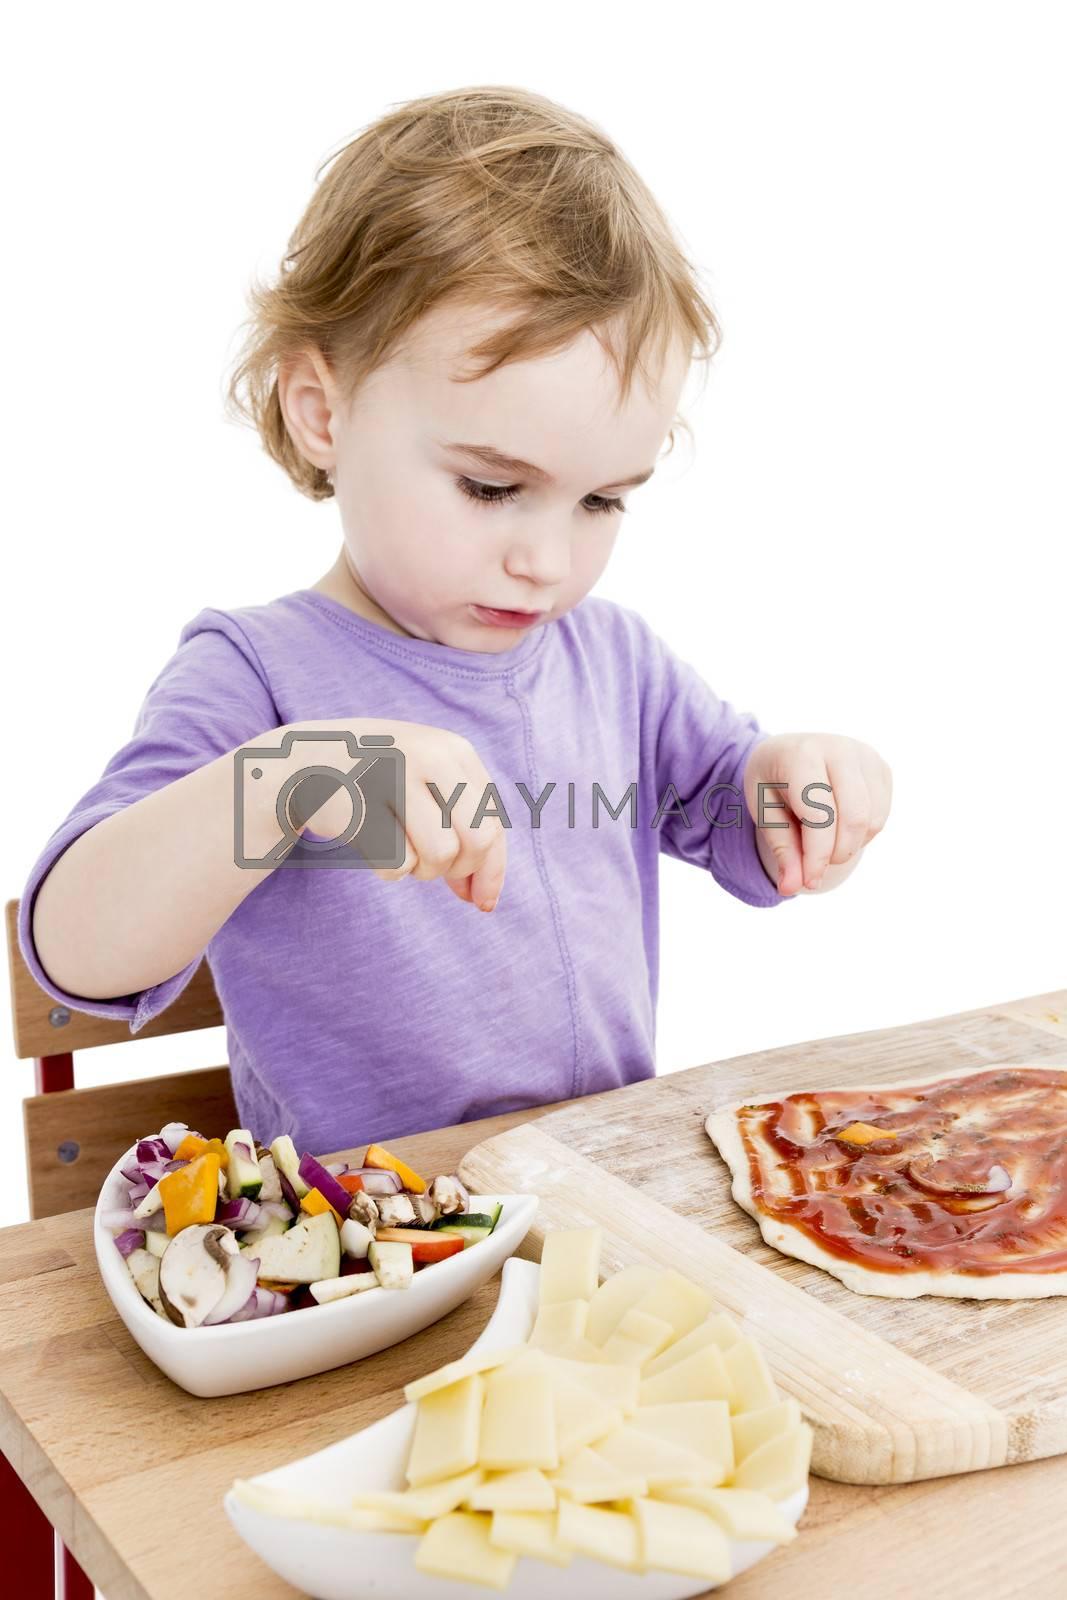 girl making fresh pizza in white background. studio shot